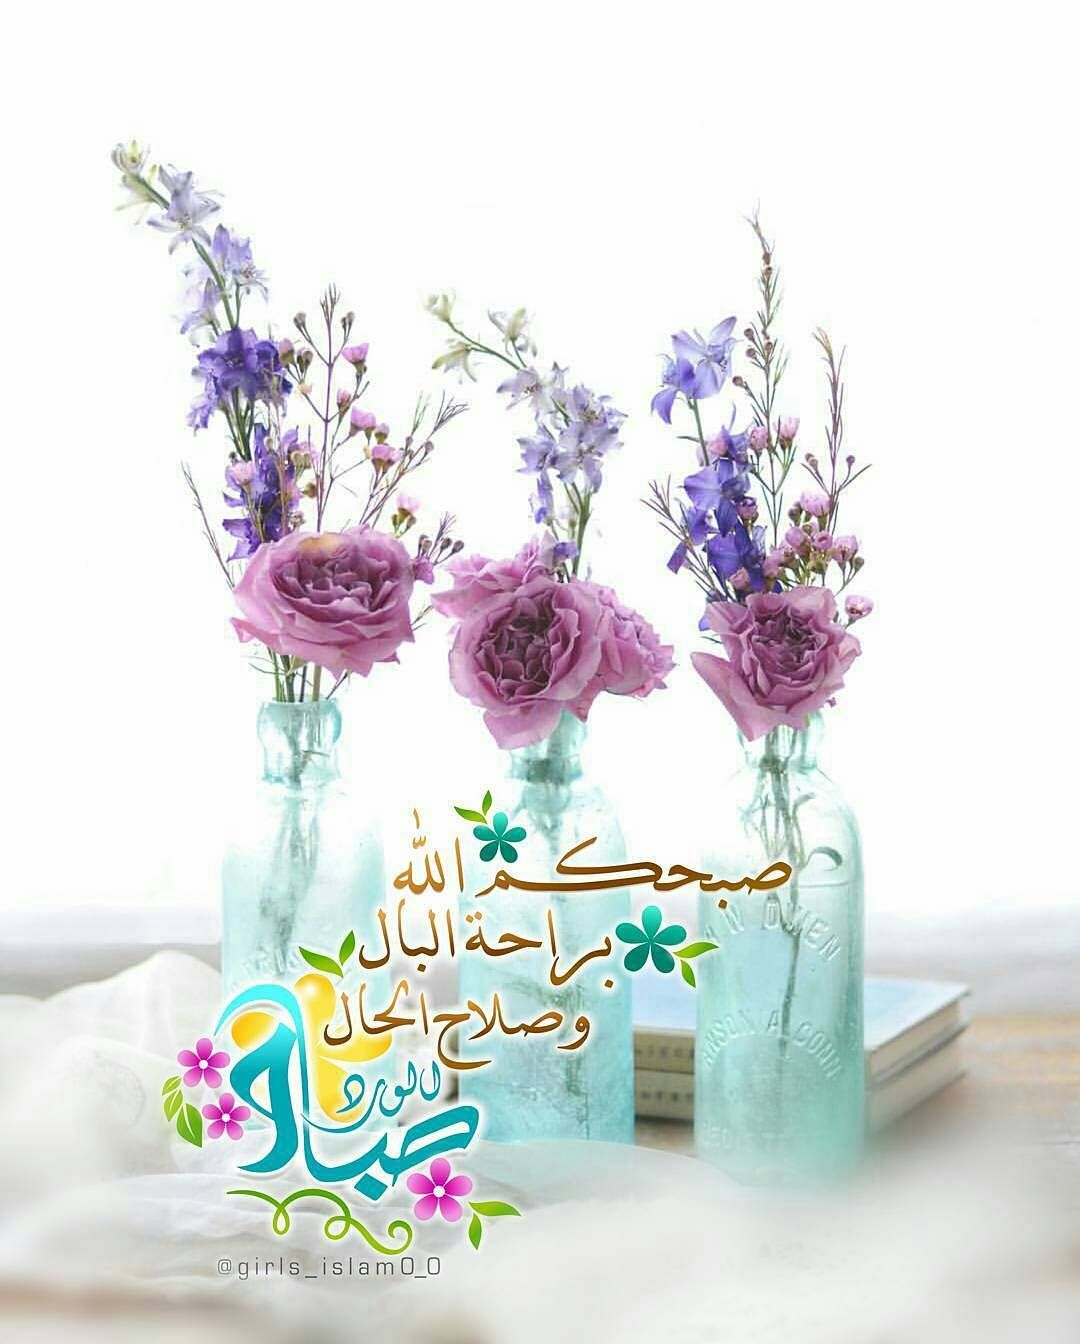 Girls Islam0 0 Girls Islam0 0 يا رب يا من أشرقت الشمس بأمرك و تنفس الصبح بقدرتك و Beautiful Morning Messages Morning Greetings Quotes Good Morning Photos